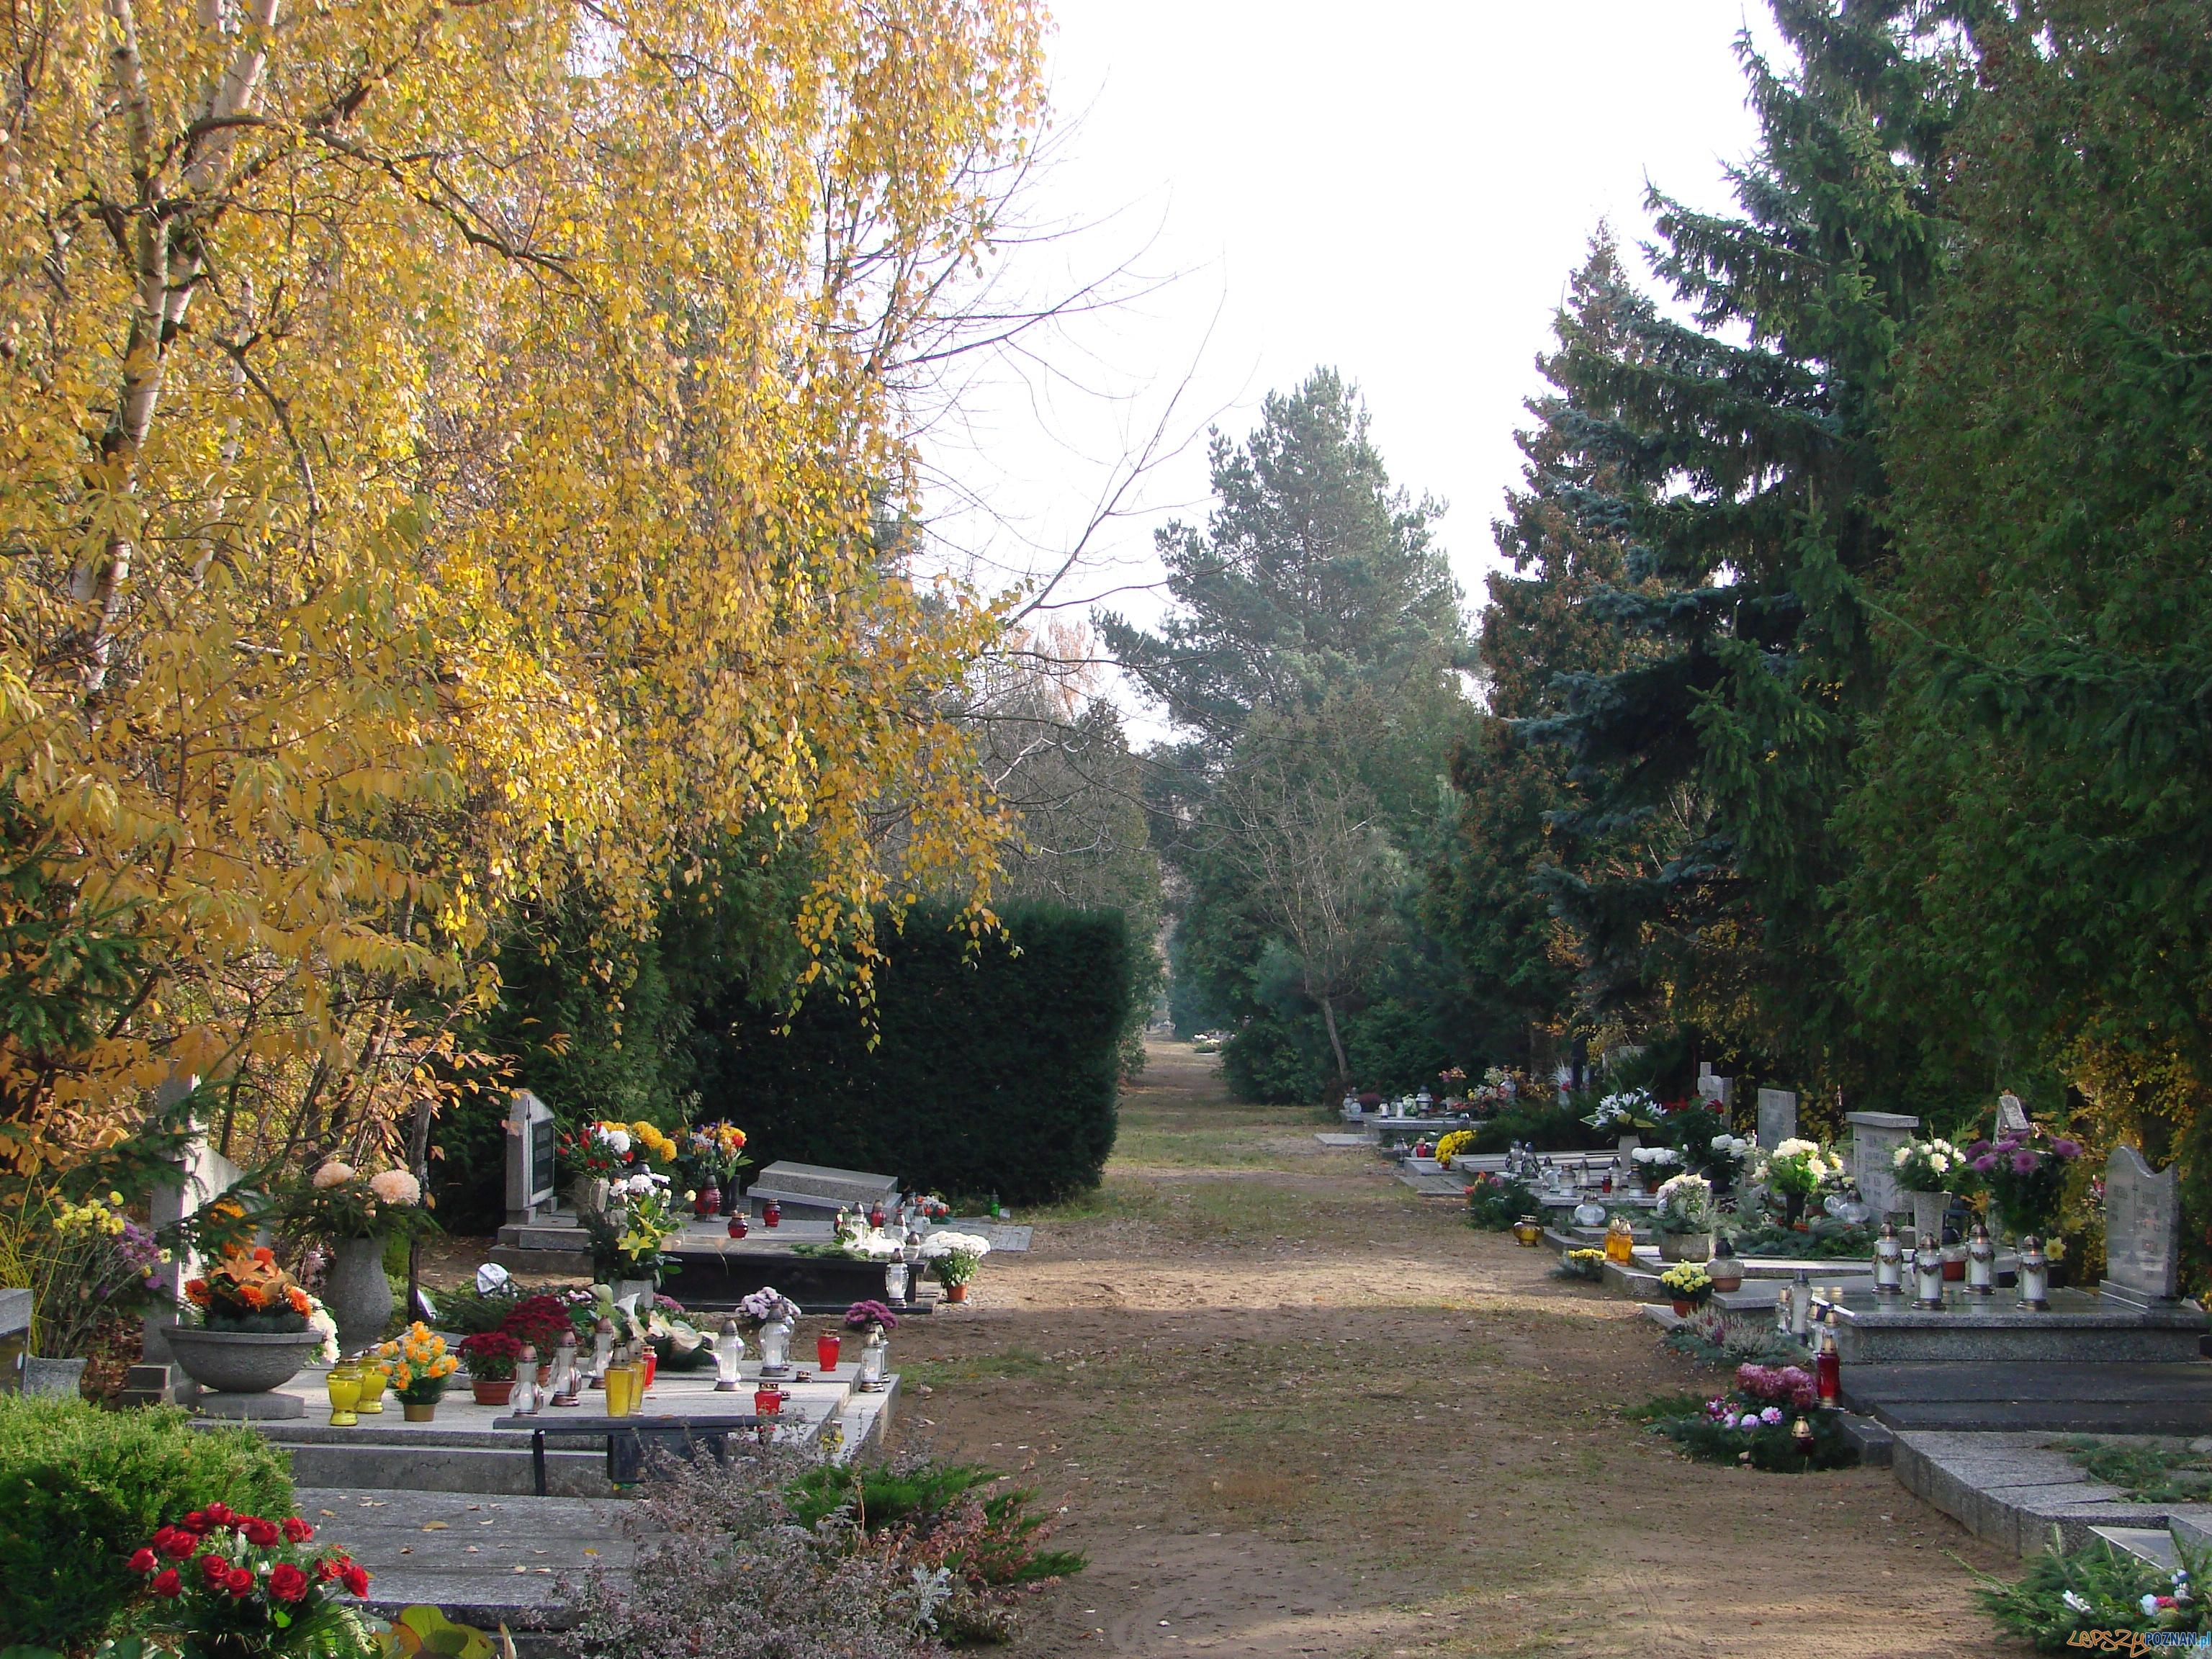 Cmentarz Junikowski  Foto: lepszyPOZNAN.pl / ag